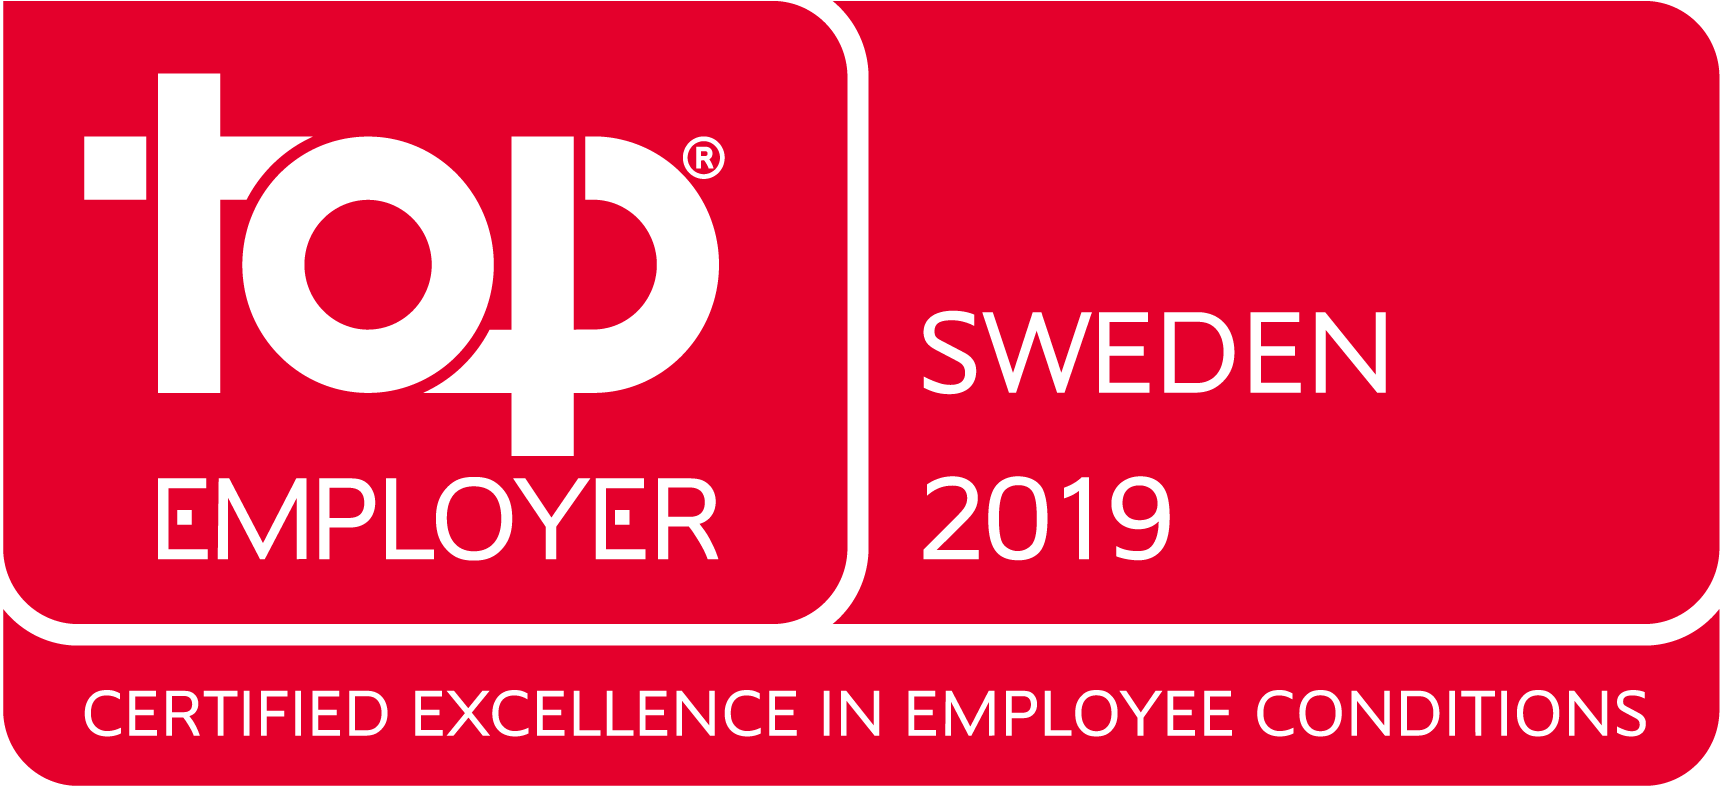 Top_Employer_Sweden_English_2019